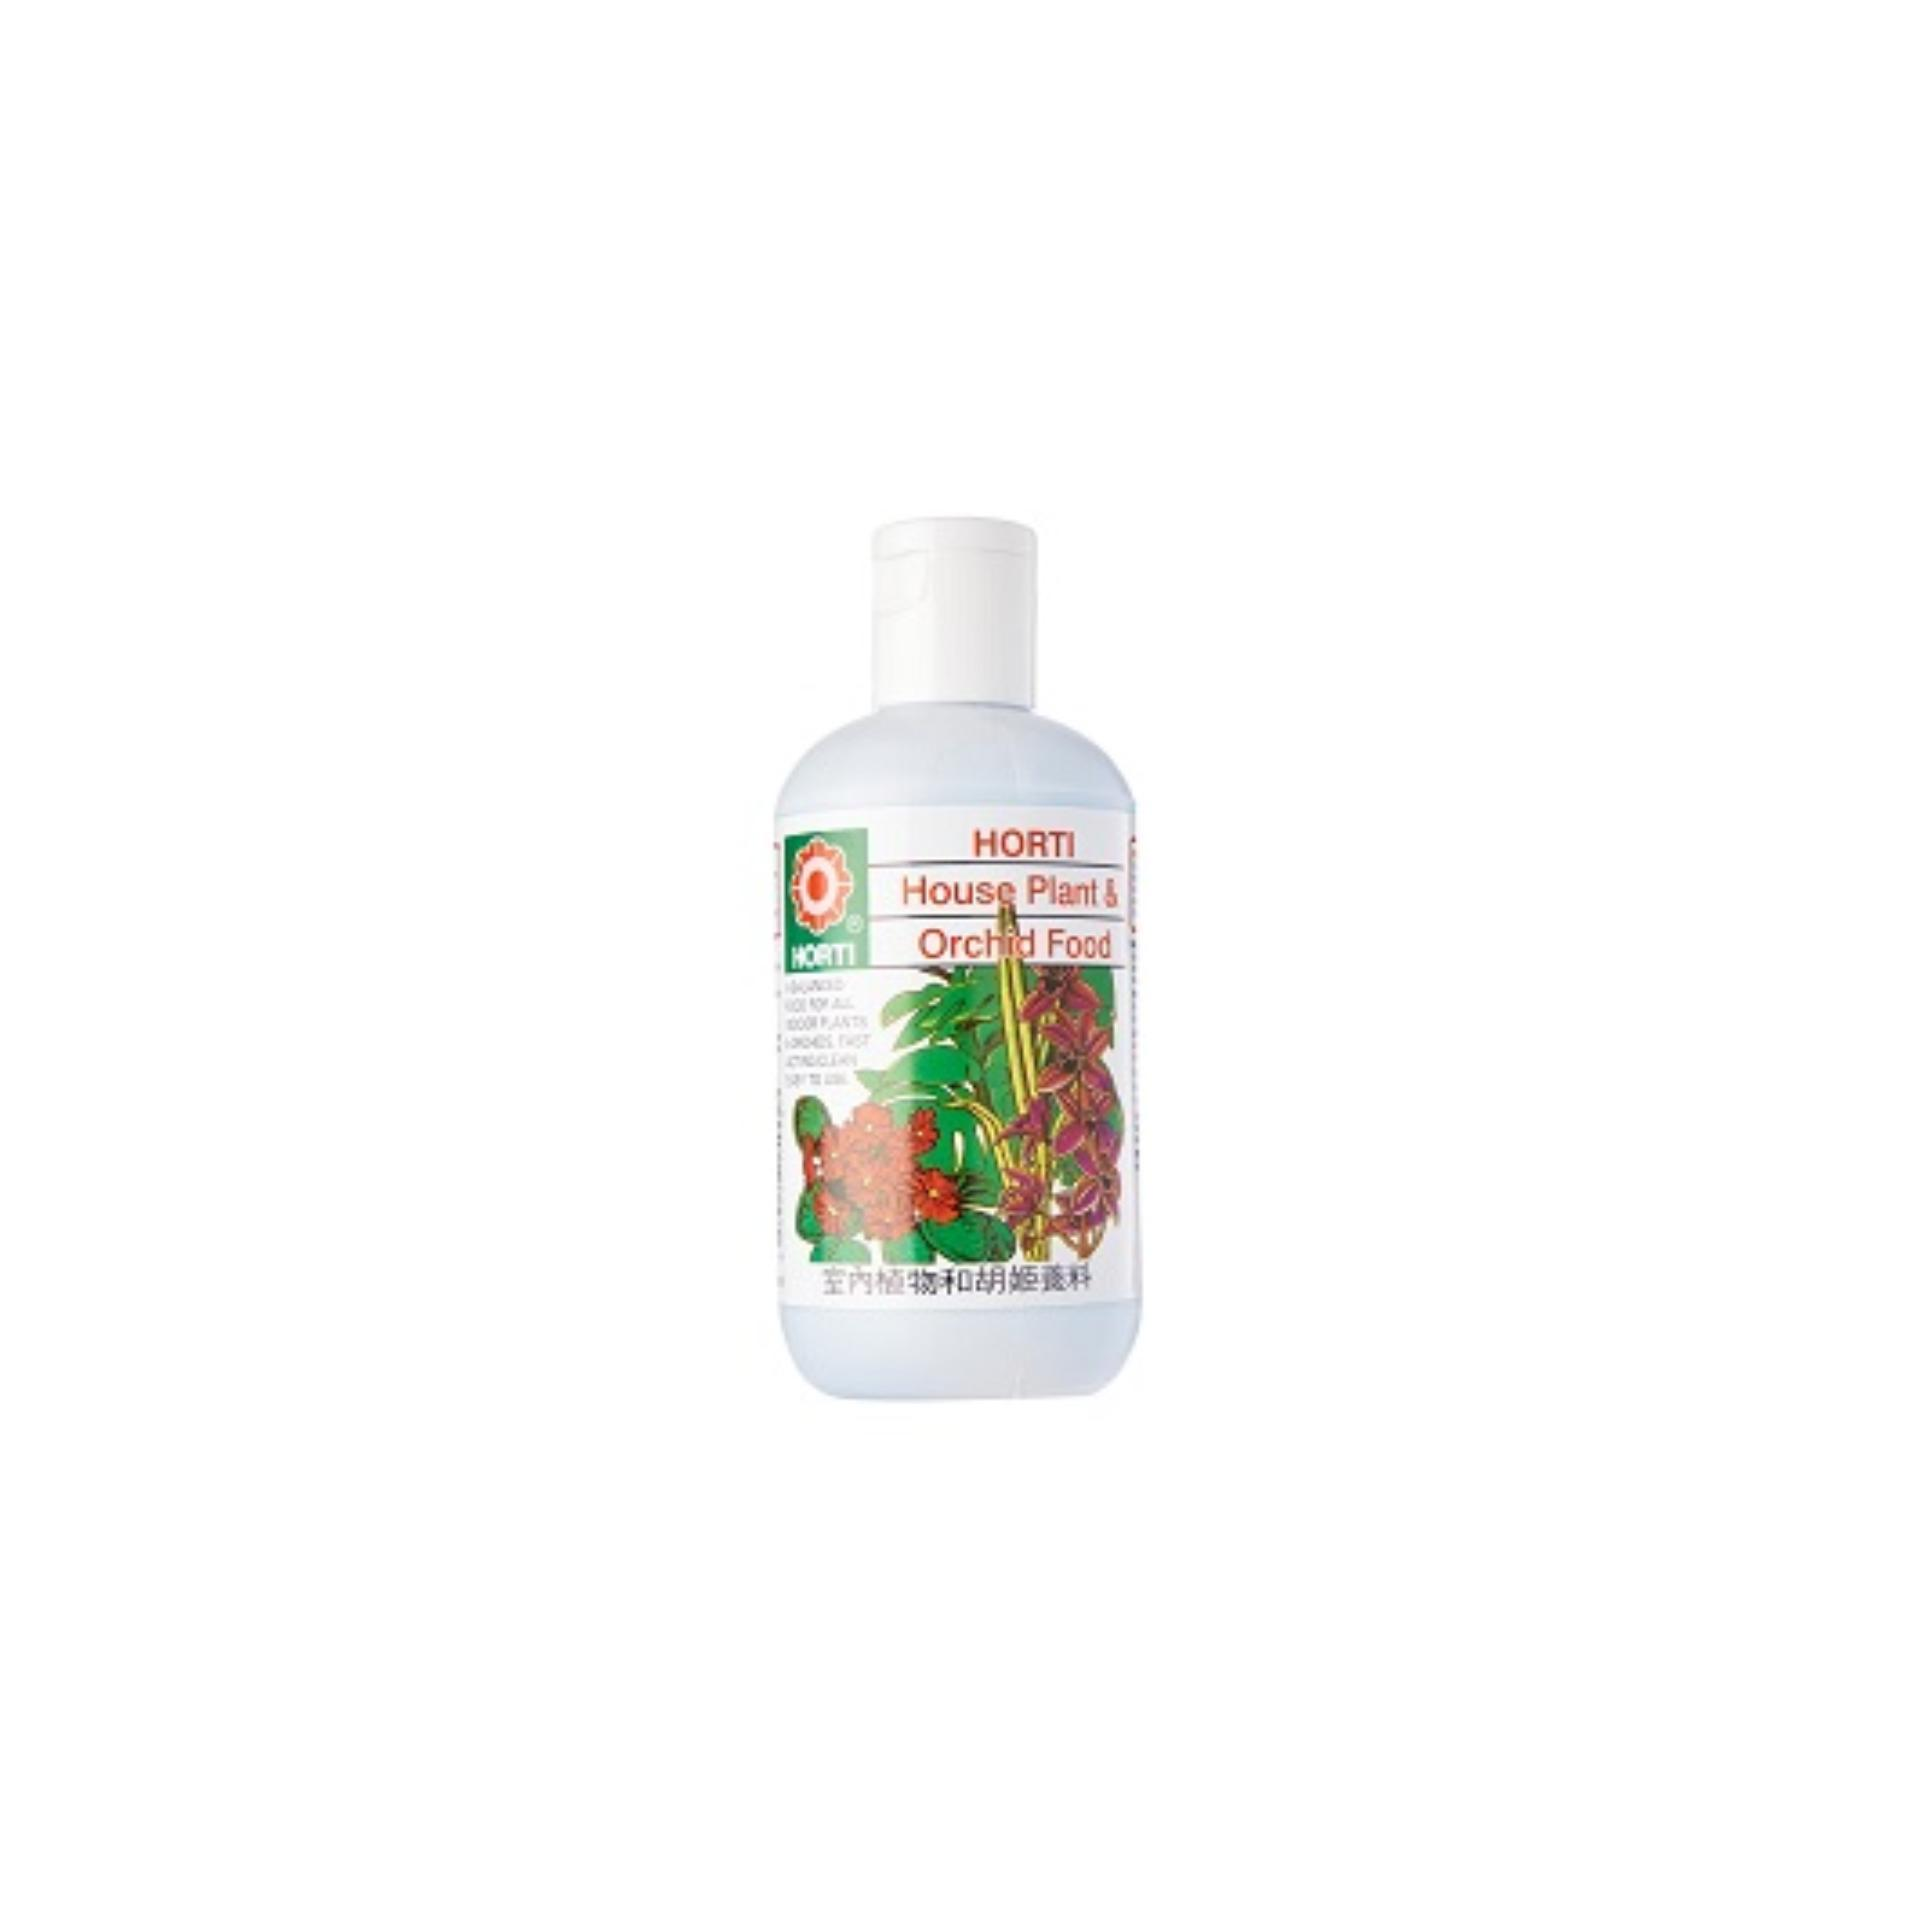 Horti Houseplant & Orchid Food Liquid Fertilizer [250ml]